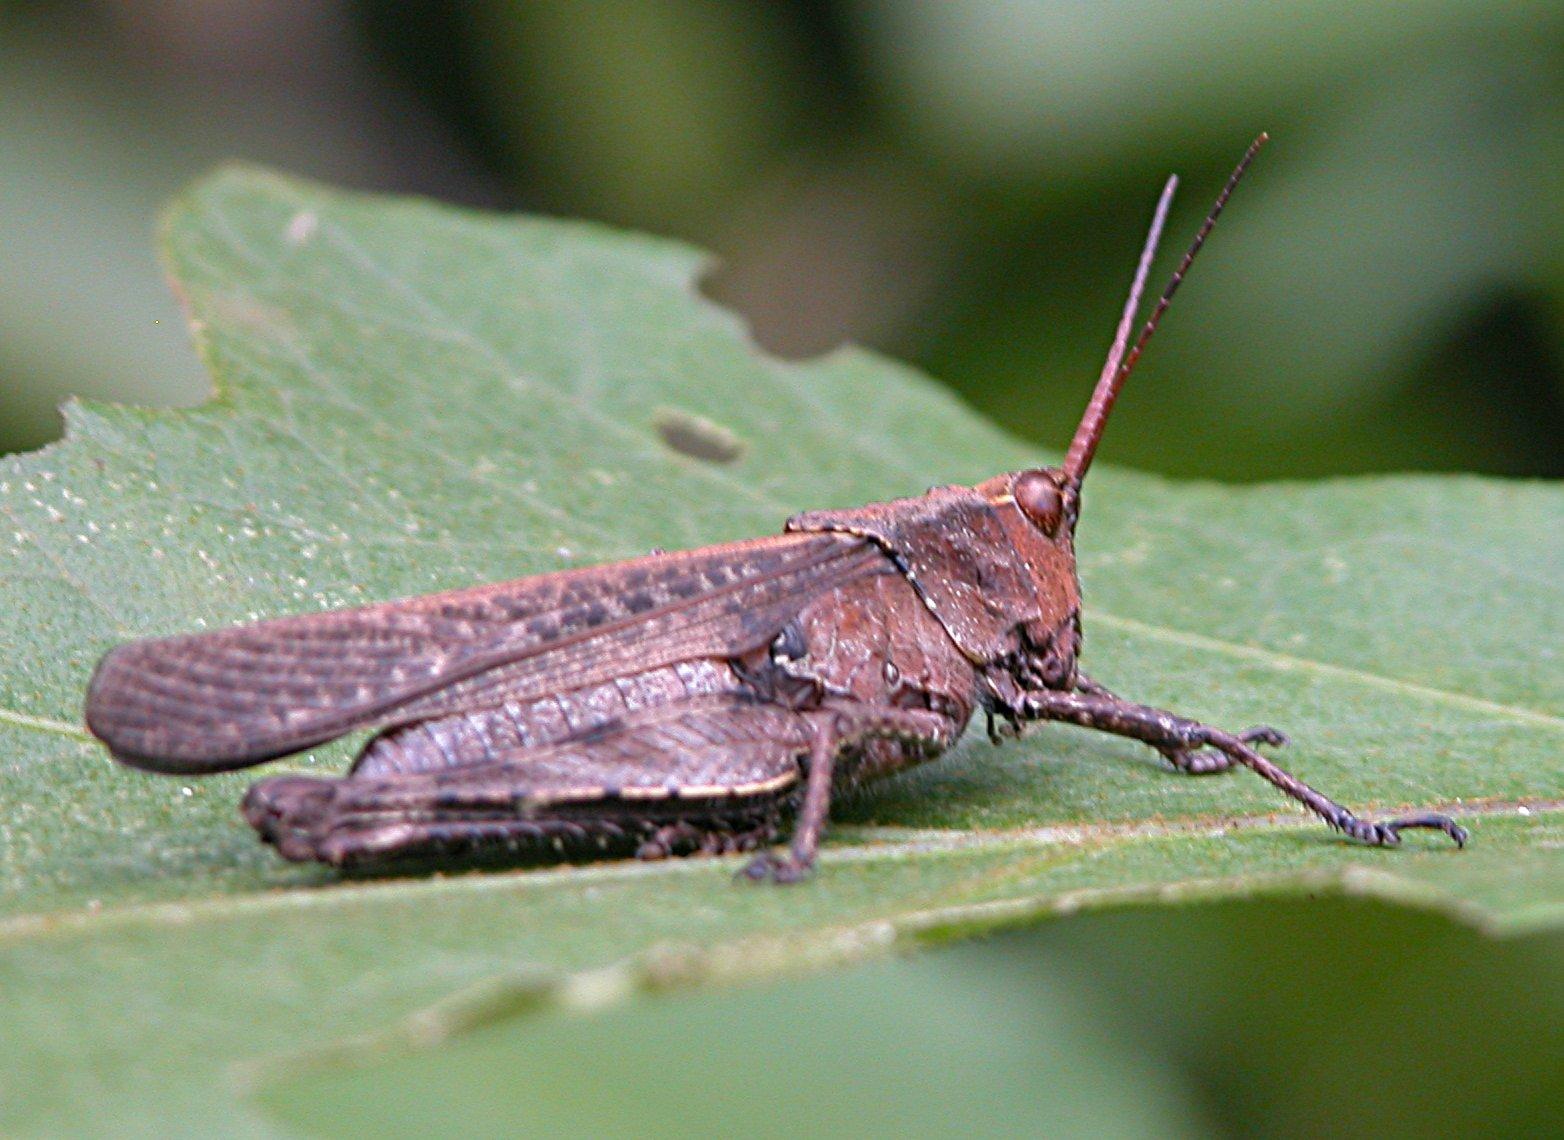 Comparing essay about grasshopper